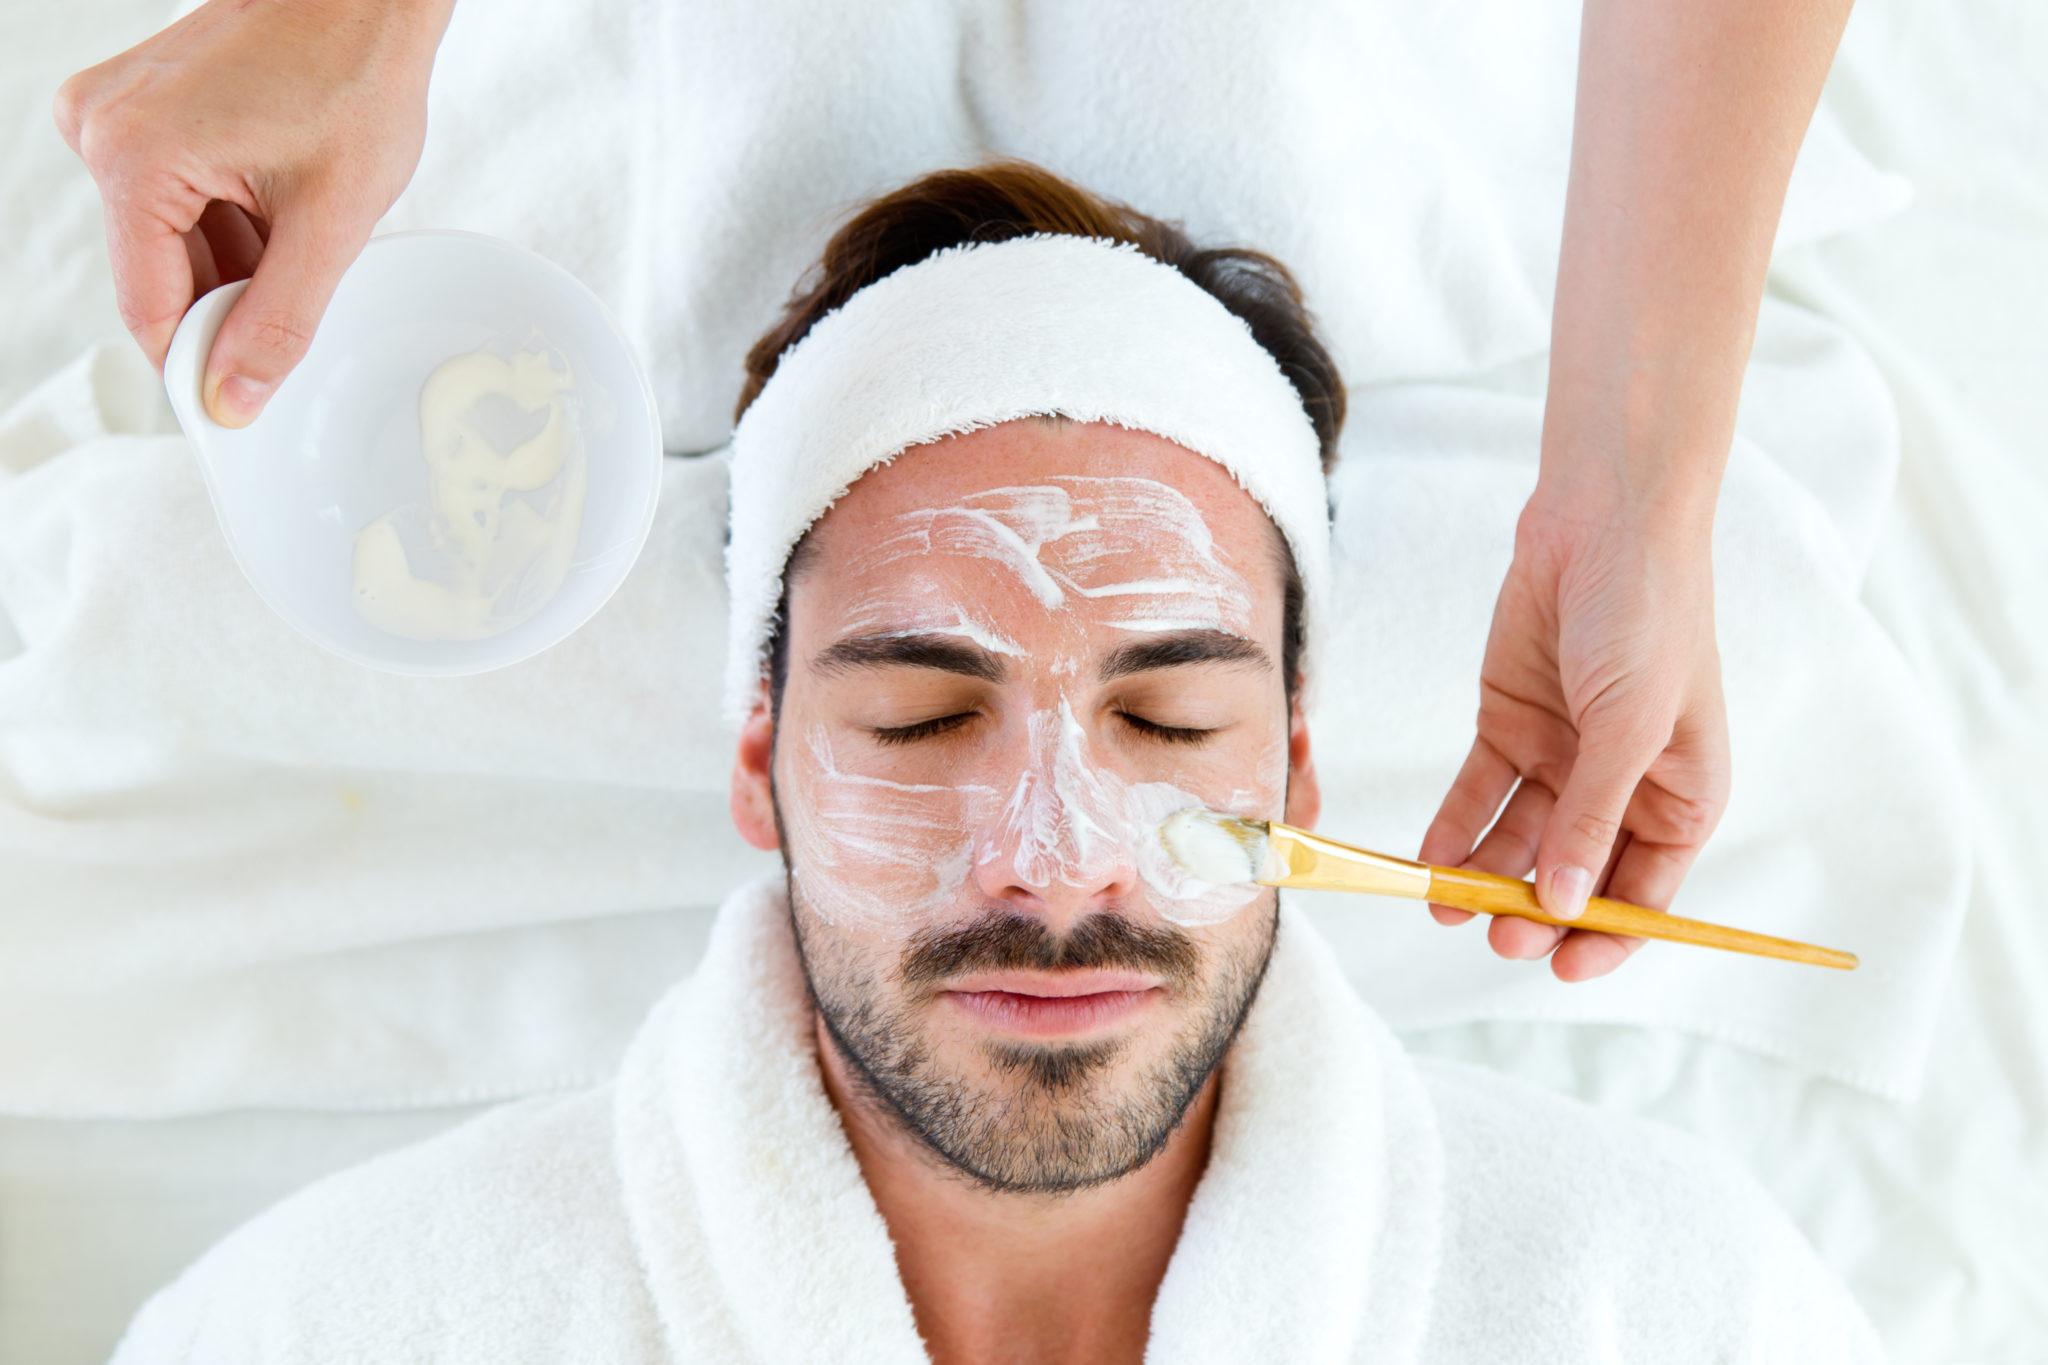 Body Skincare for men and women